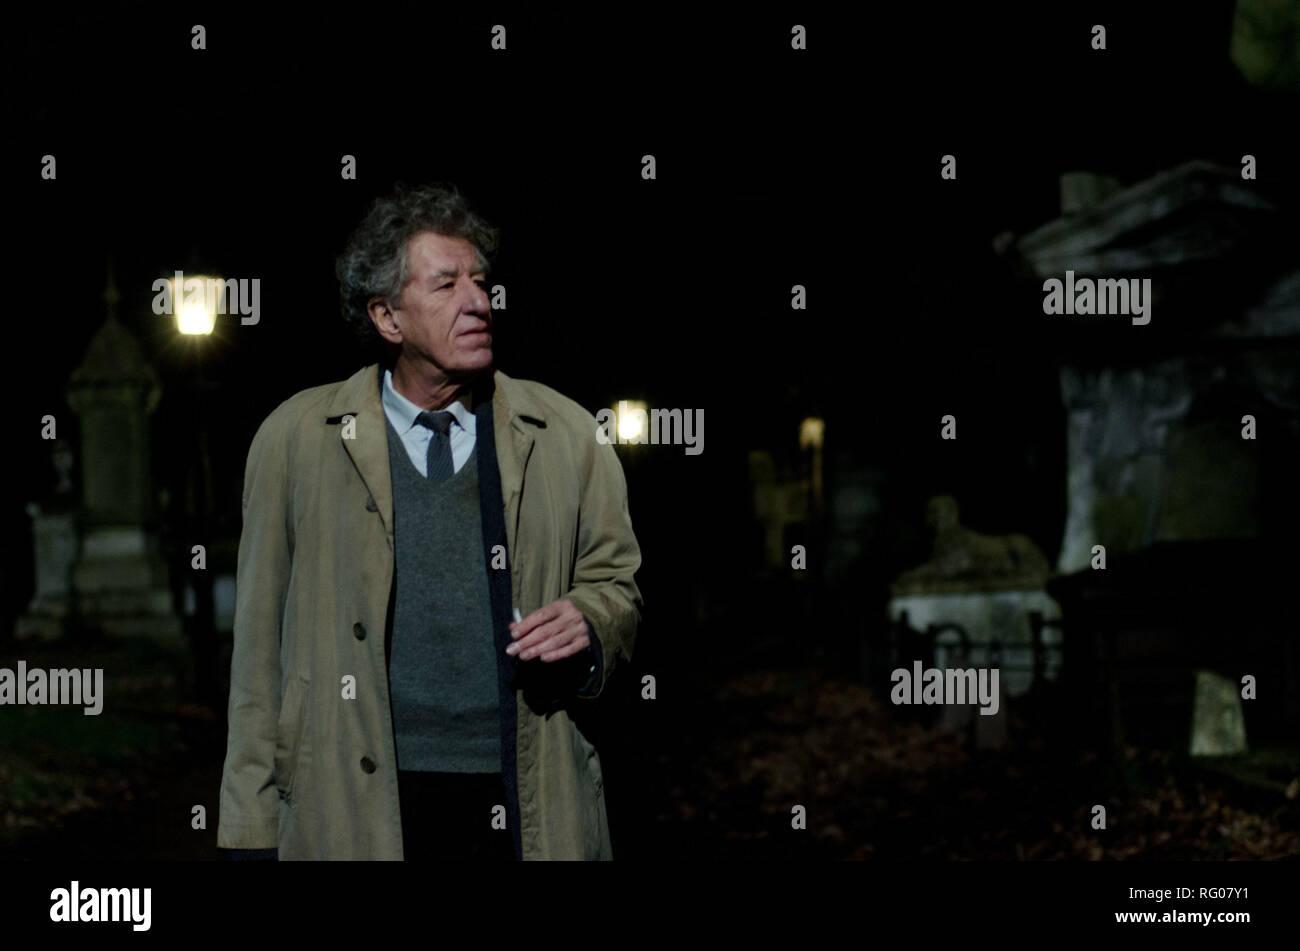 Original film title: FINAL PORTRAIT. English title: FINAL PORTRAIT. Year: 2017. Director: STANLEY TUCCI. Stars: GEOFFREY RUSH. Credit: OLIVE PRODUCTIONS/POTBOILER PRODUCTIONS/RIVERSTONE PICTURES / Album - Stock Image